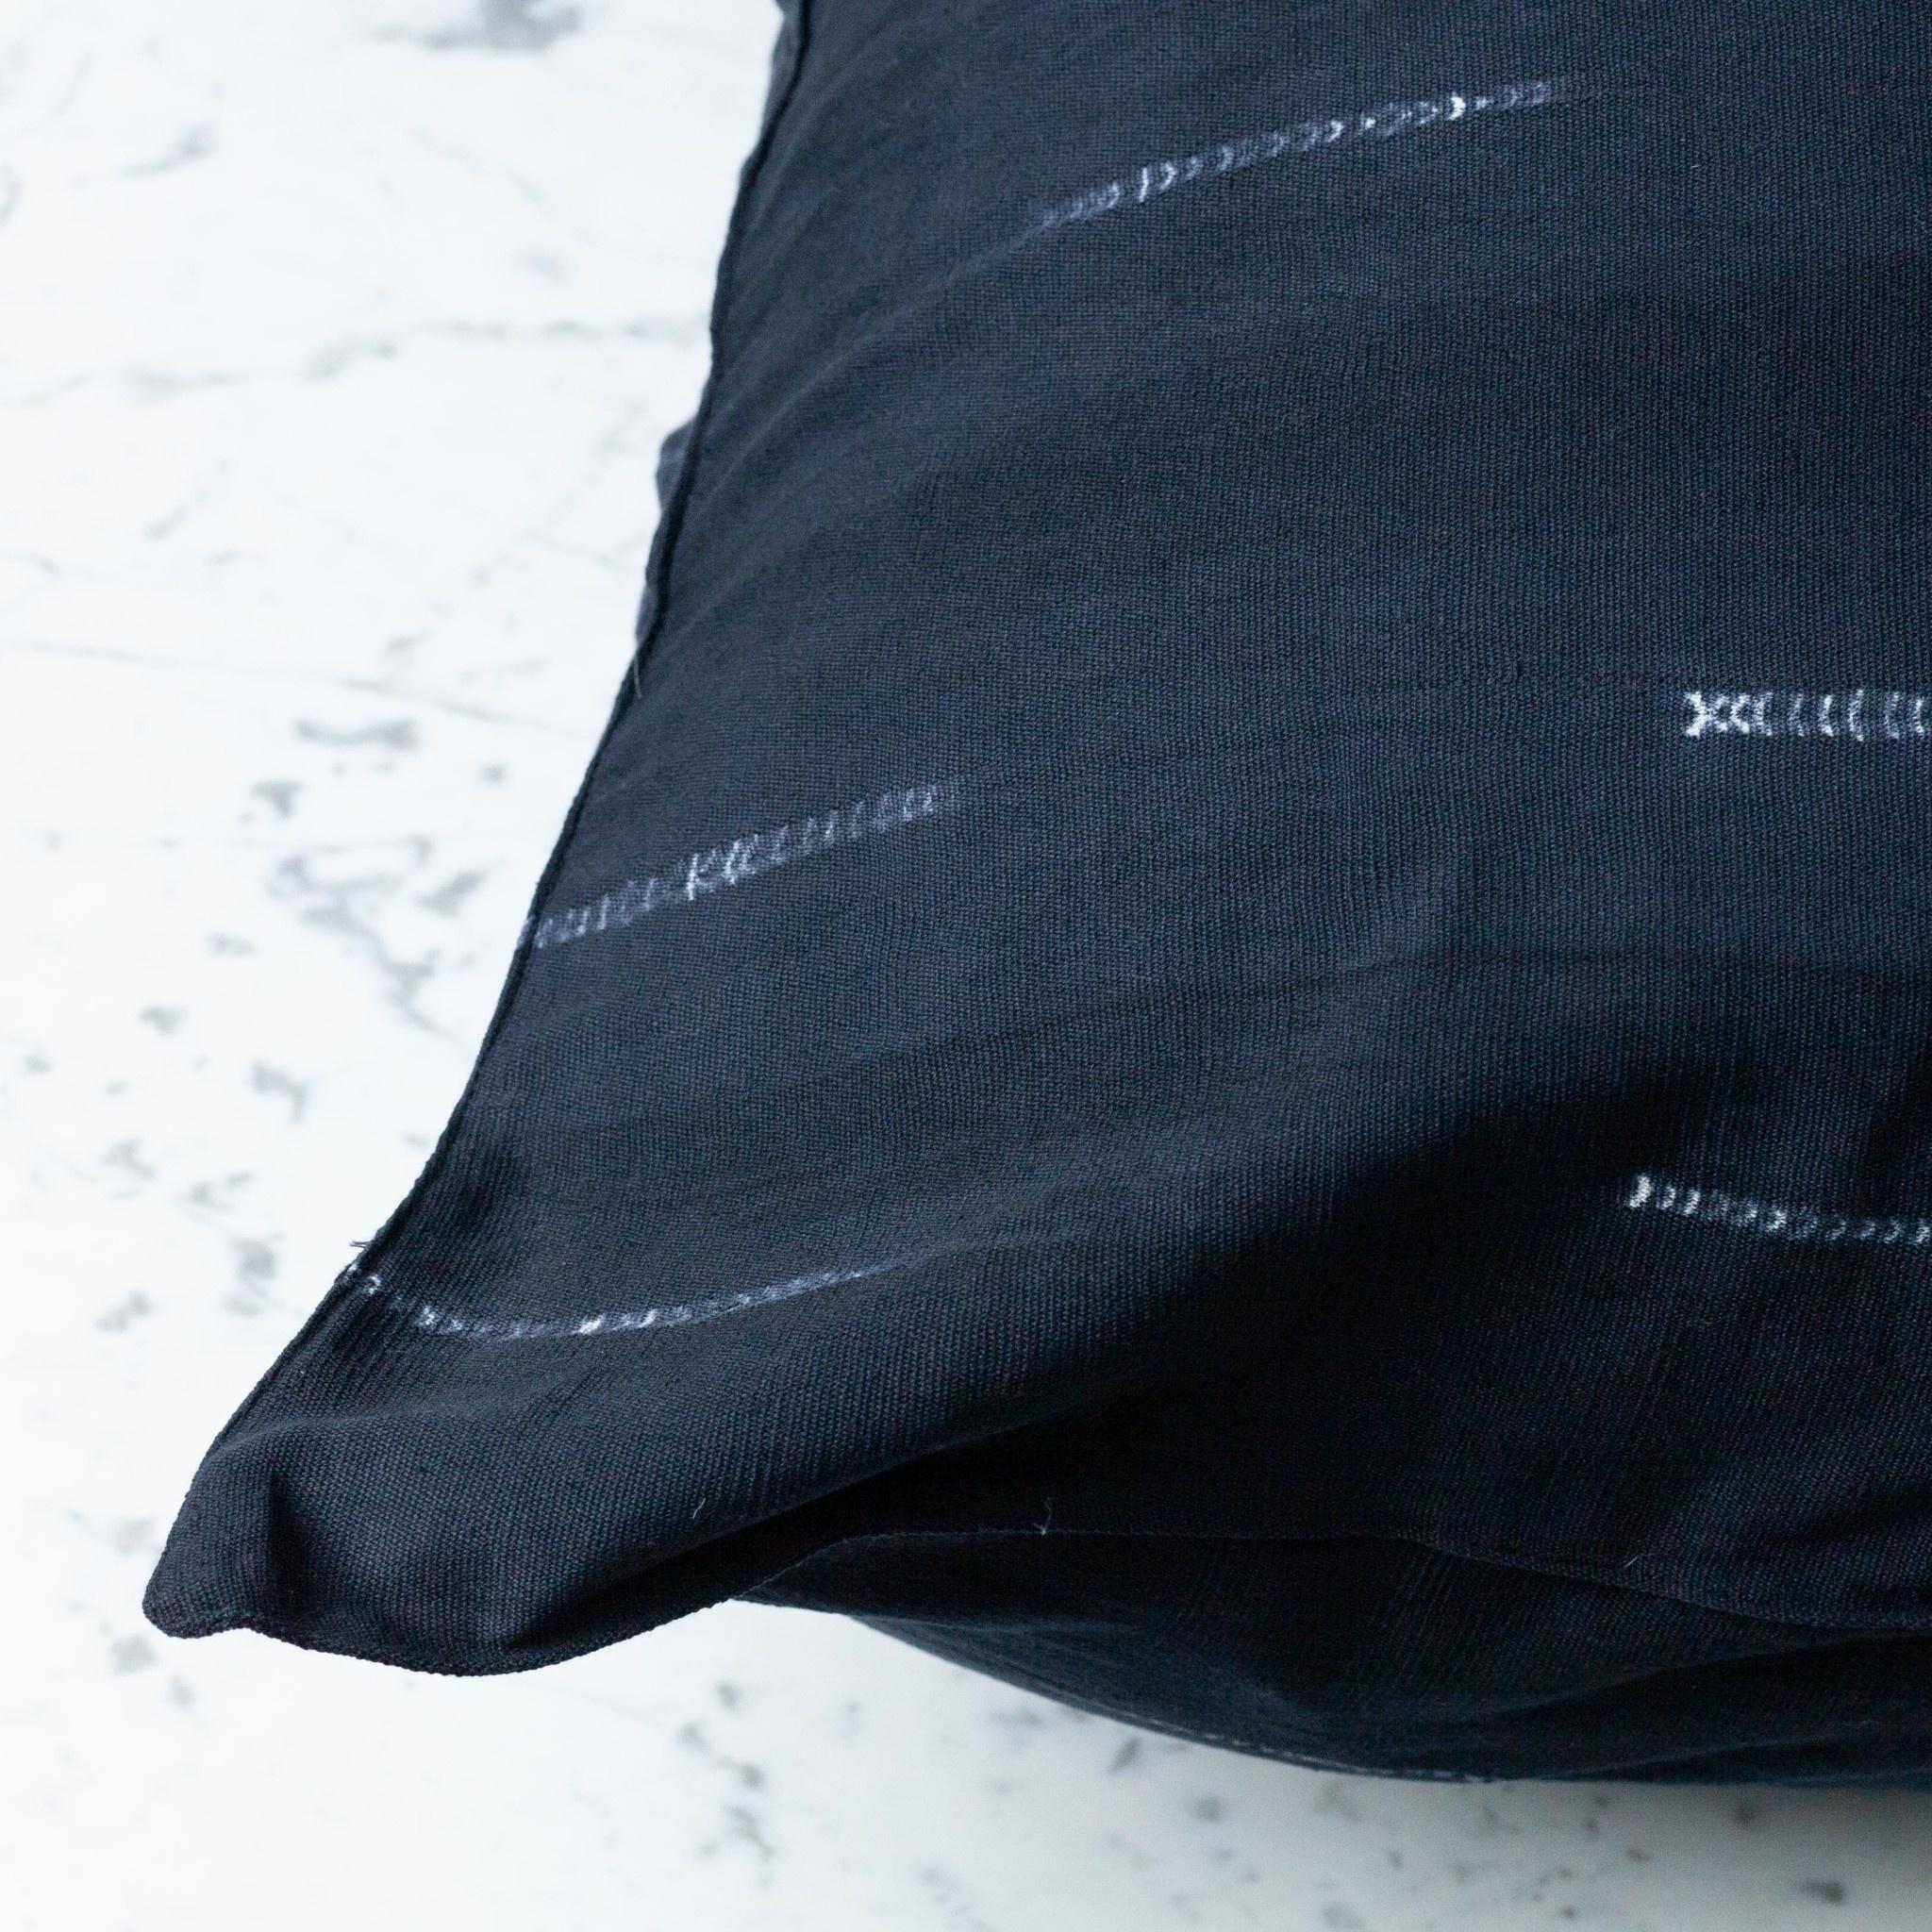 "TENSIRA 24 x 24"" Handwoven Cotton Pillow with Down Insert - Button Closure - Black Delicate Stitch Dye Stripe"